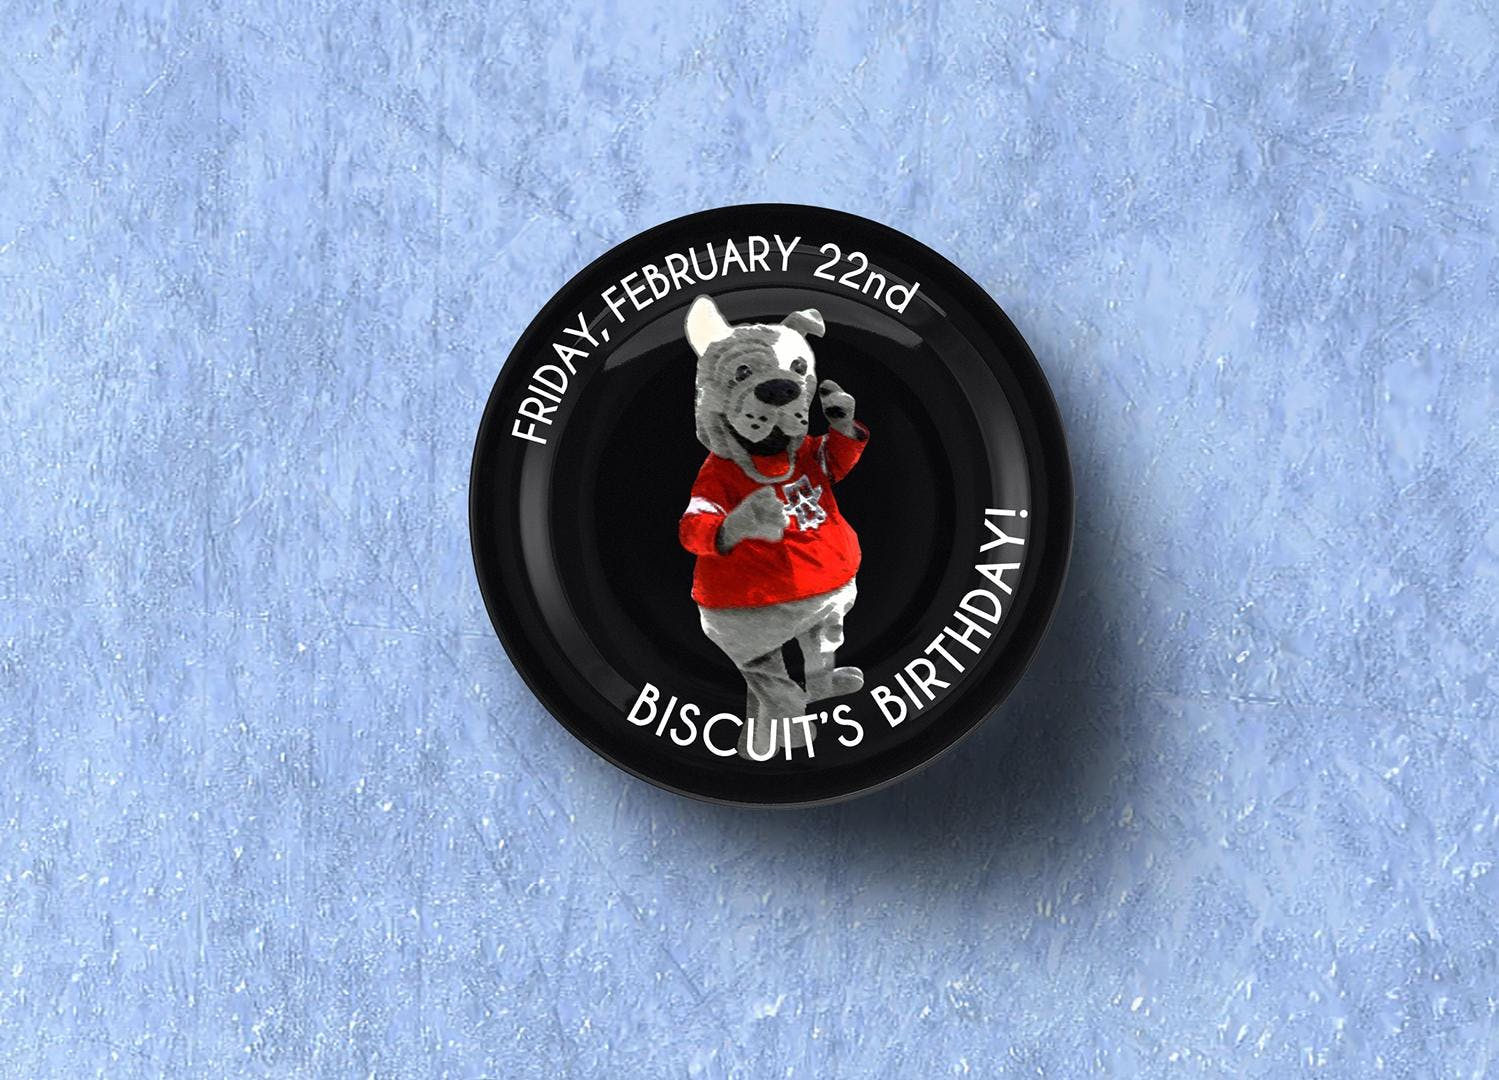 Biscuit's Birthday! Allen Americans vs Utah G